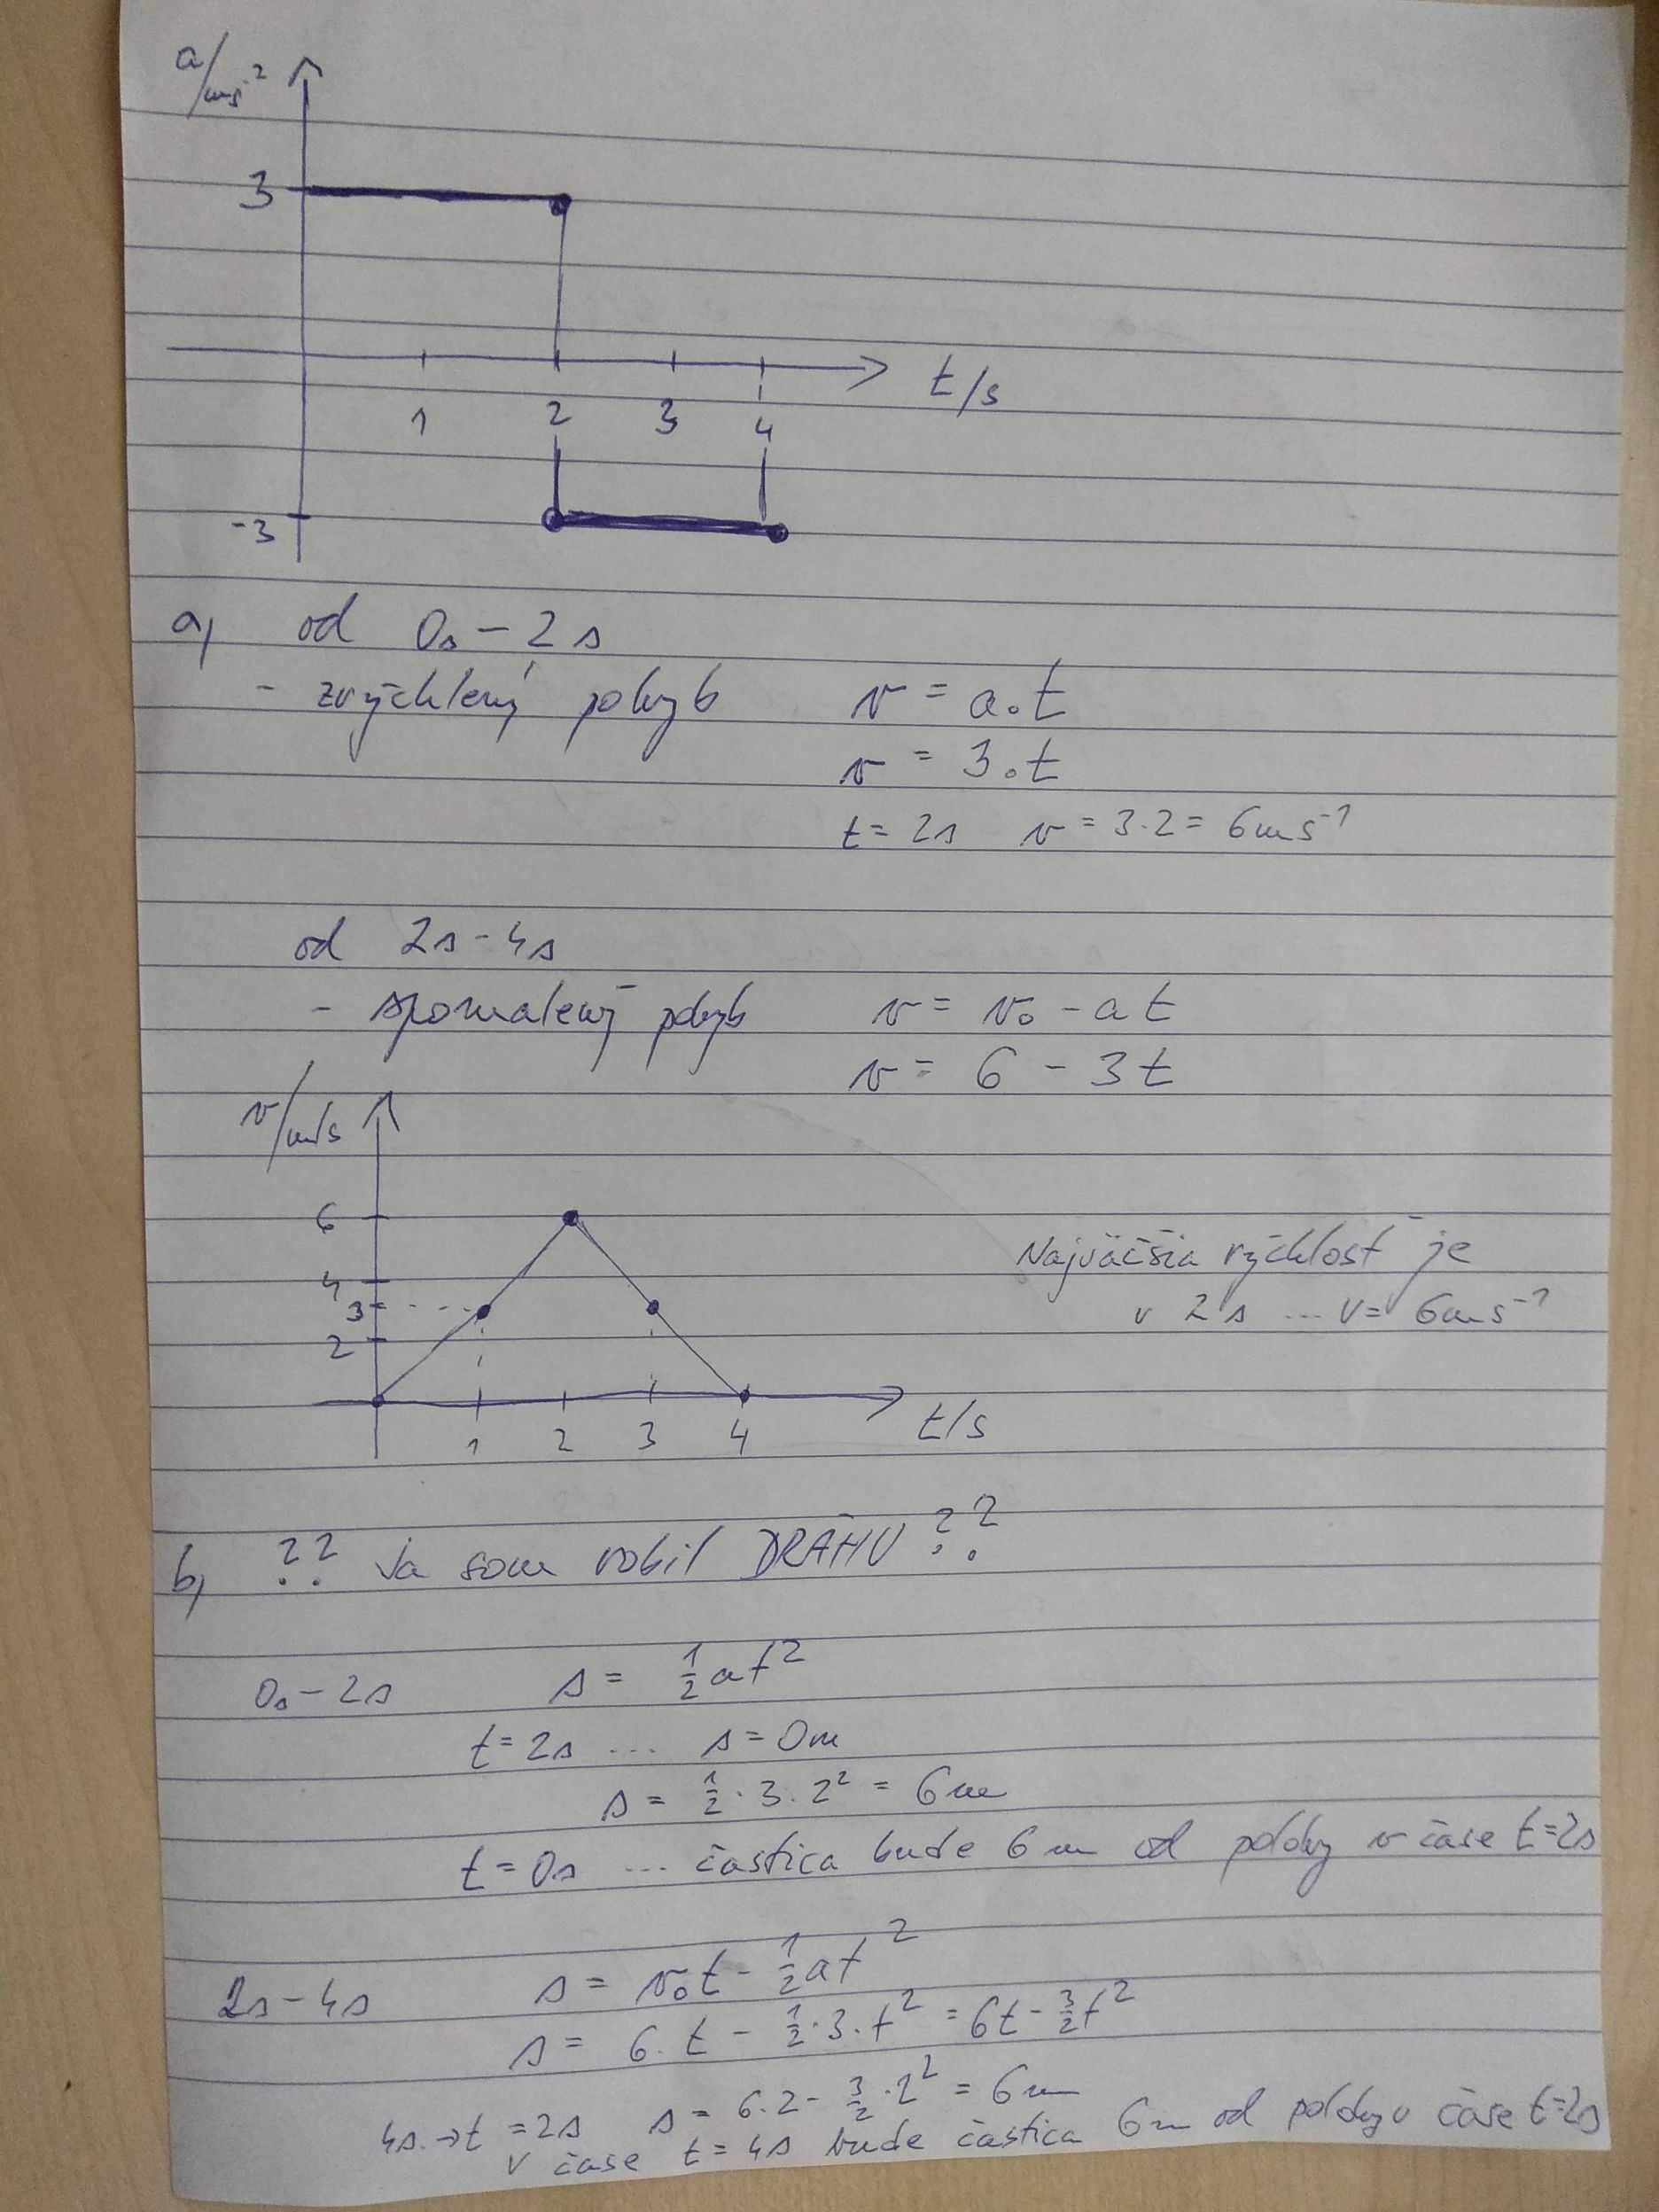 http://forum.matematika.cz/upload3/img/2018-06/44951_riesenie1a.jpg